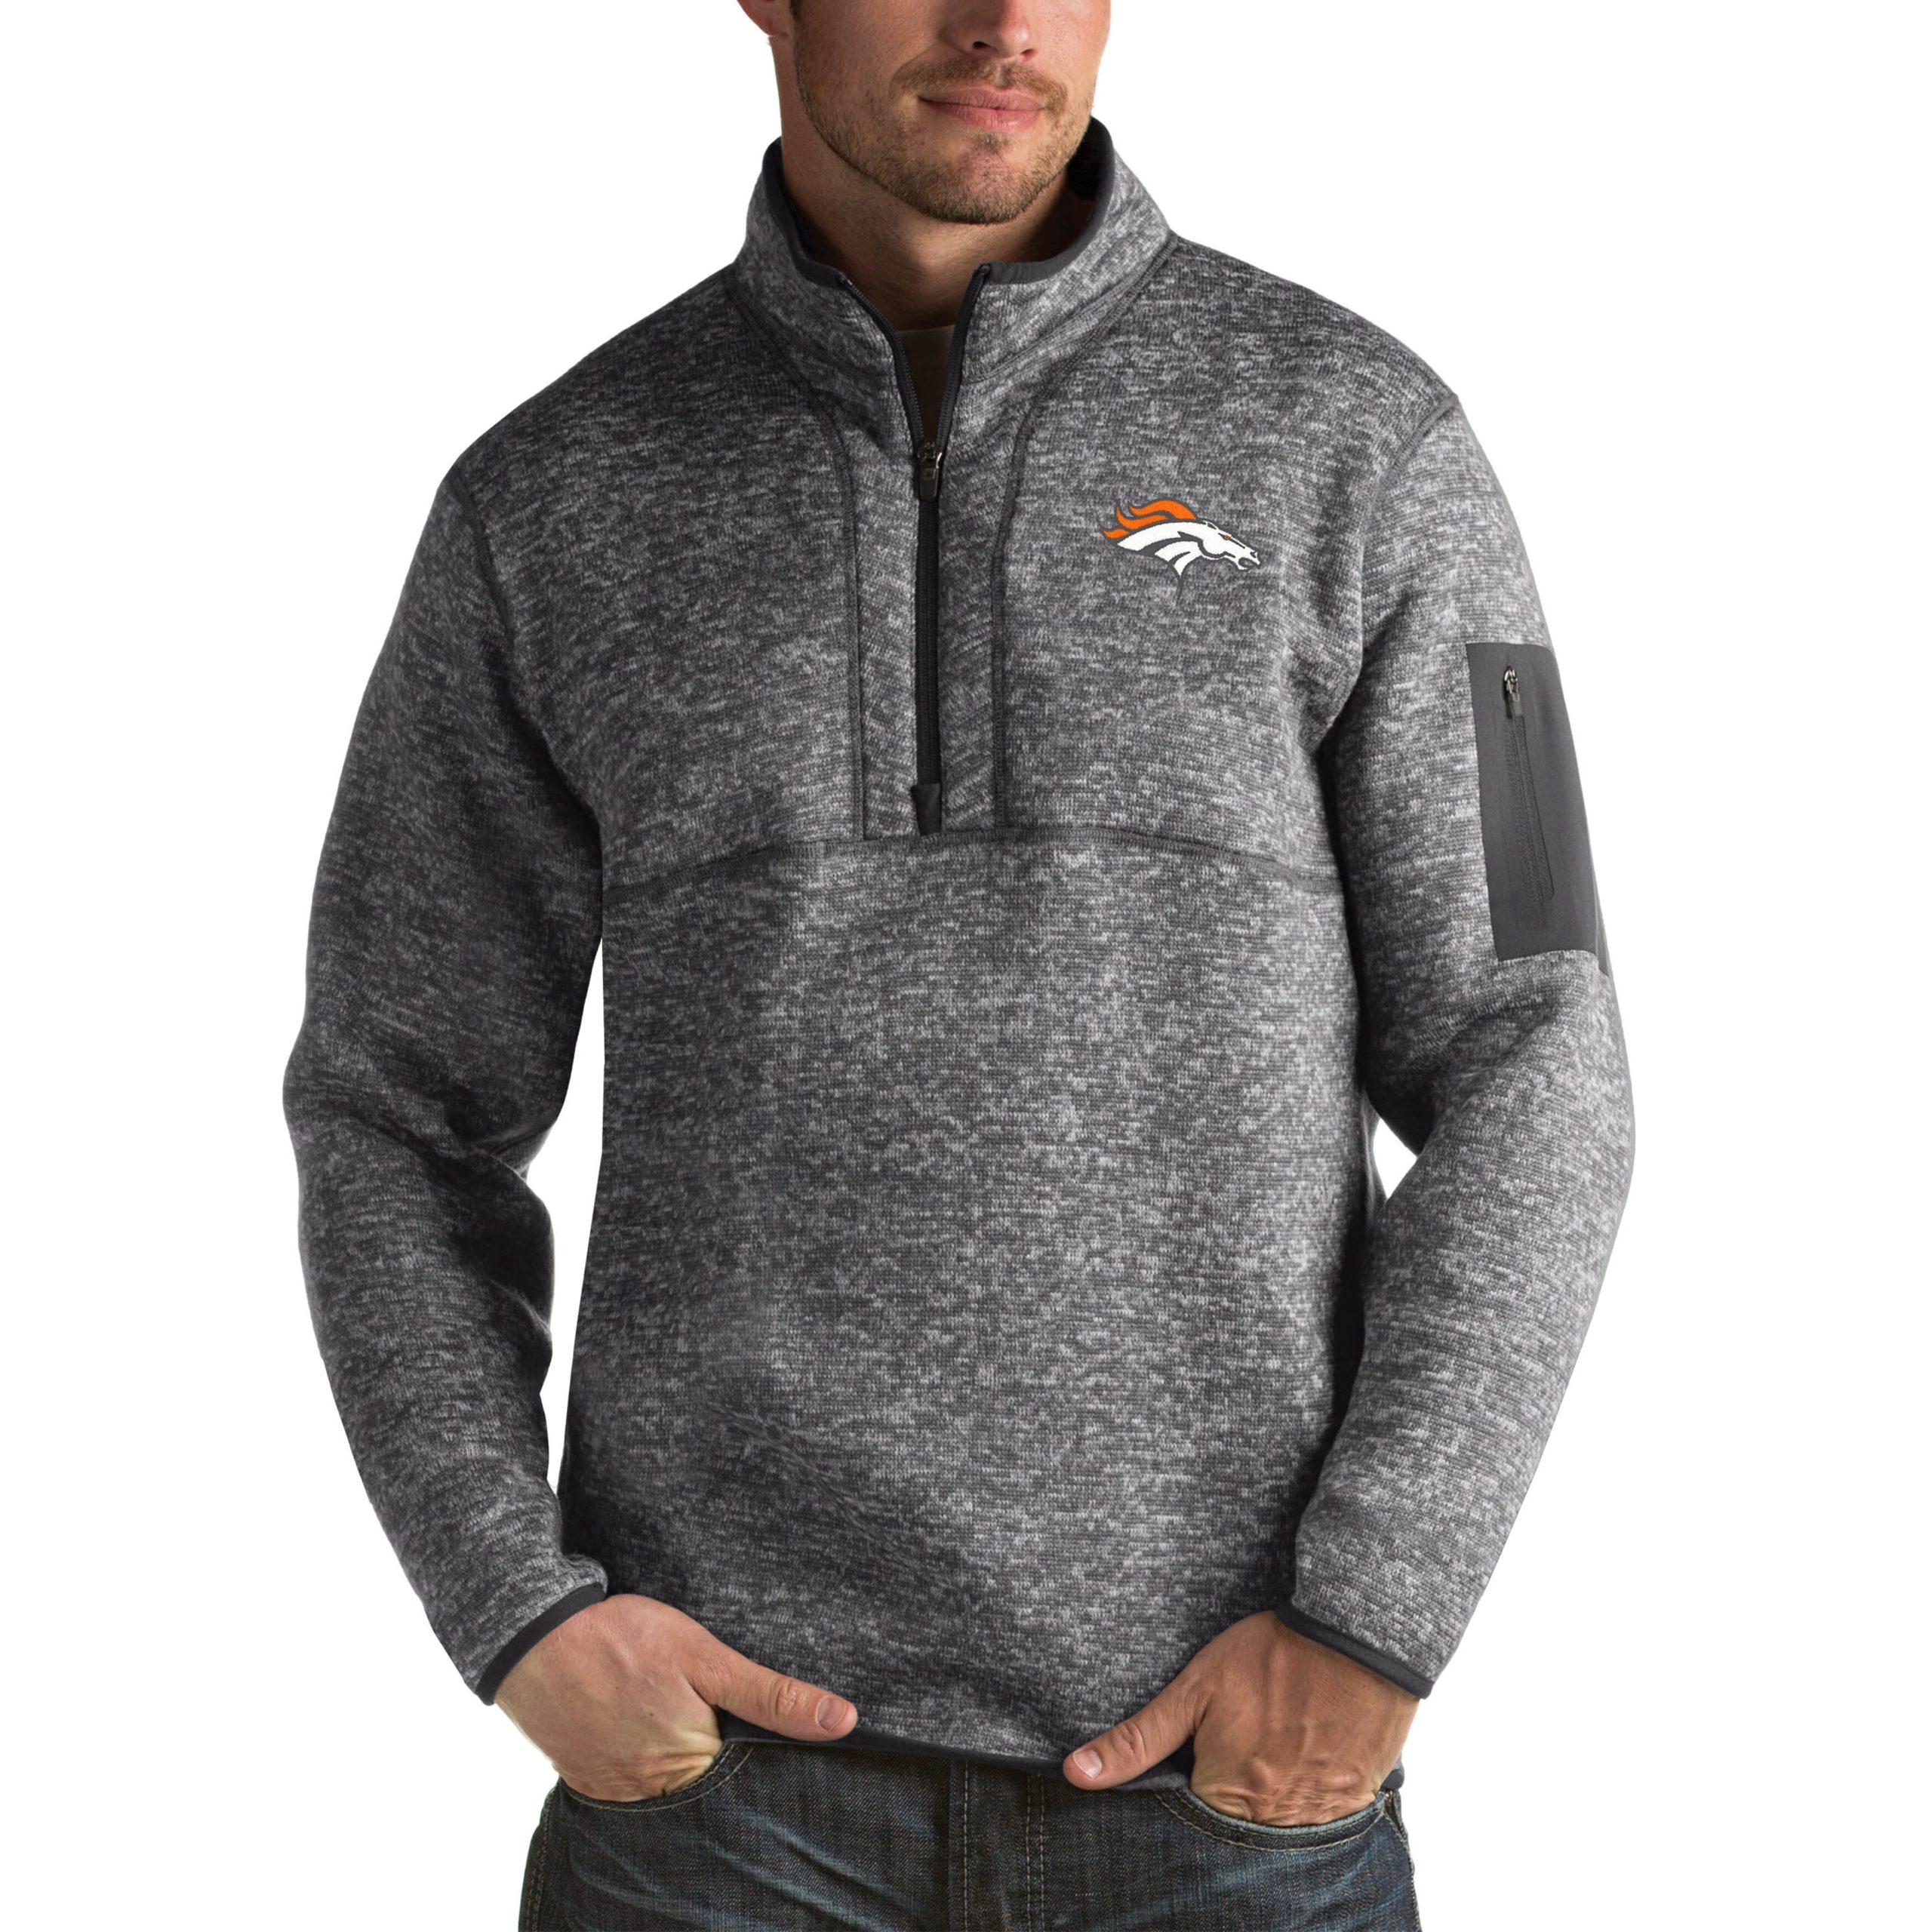 Denver Broncos Antigua Fortune Big & Tall Quarter-Zip Pullover Jacket - Charcoal